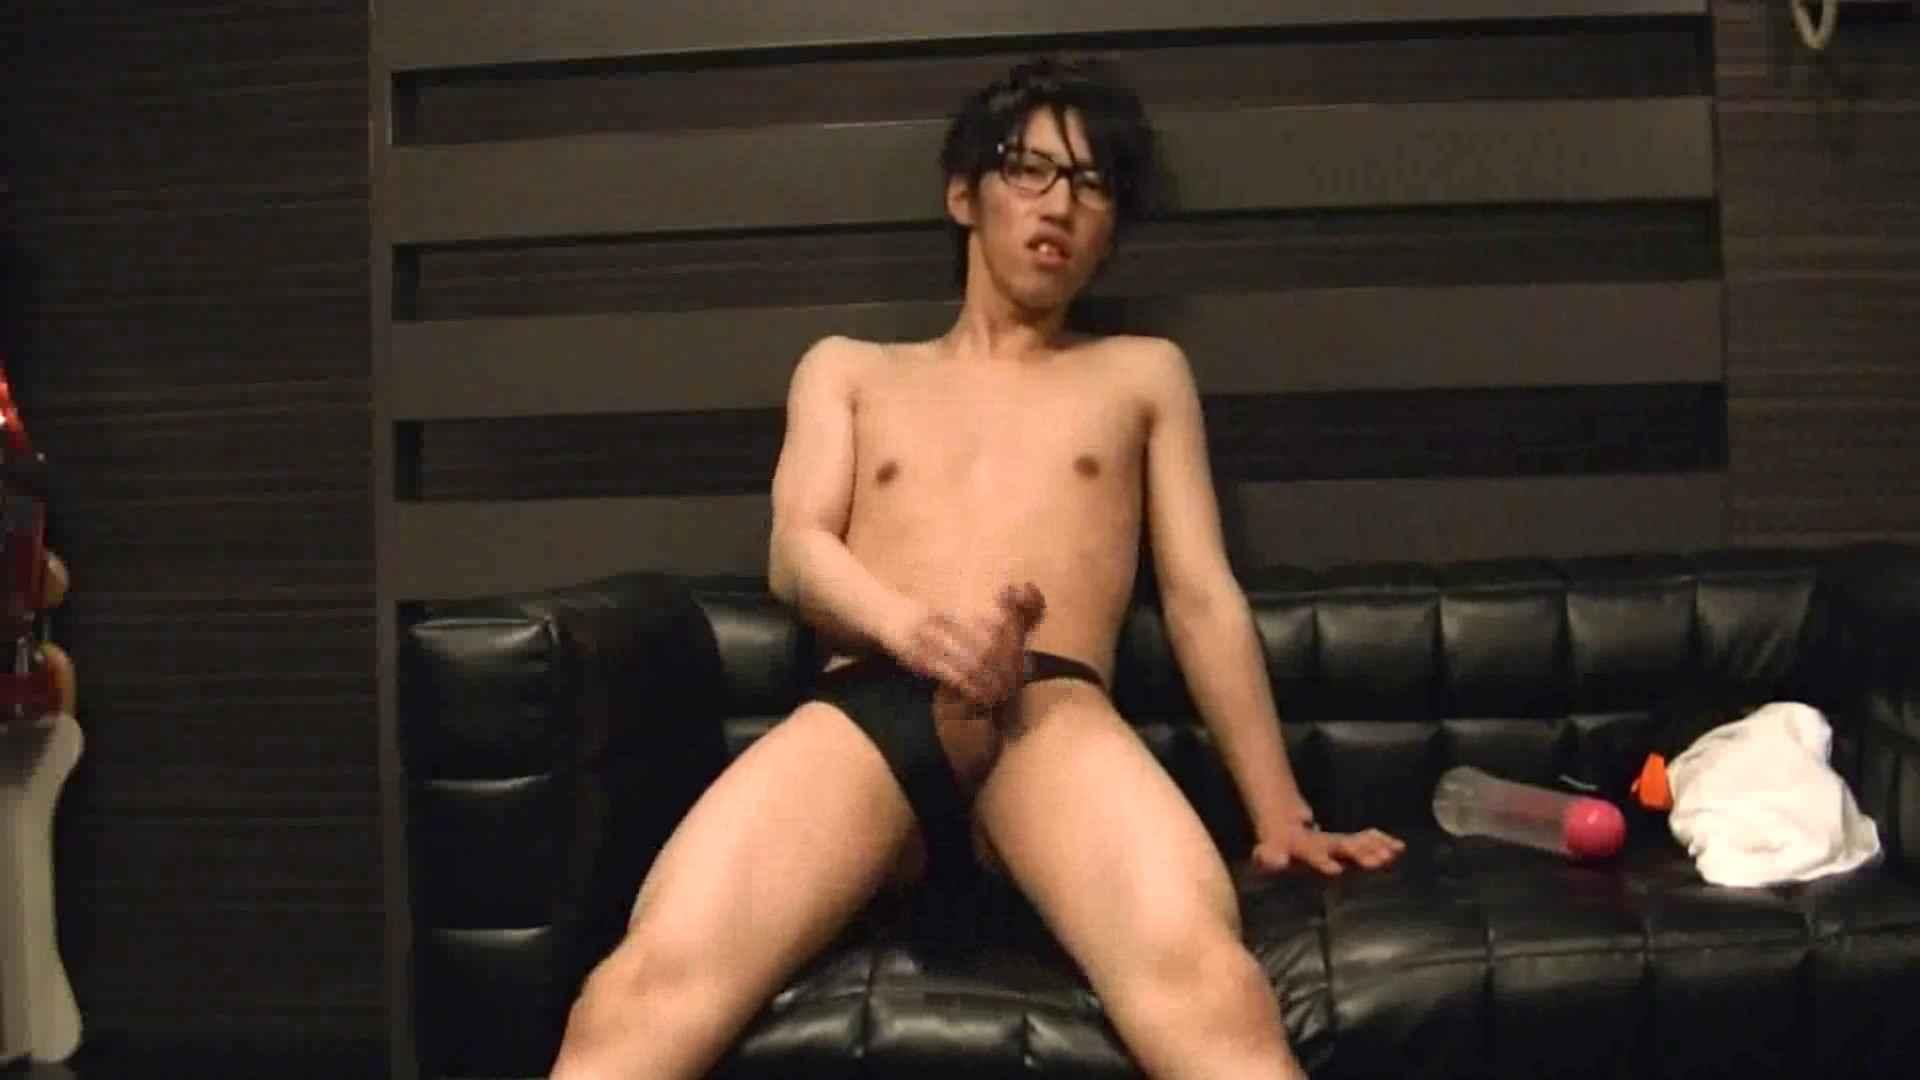 ONA見せカーニバル!! Vol3 モザ無し ゲイ無修正画像 87枚 84